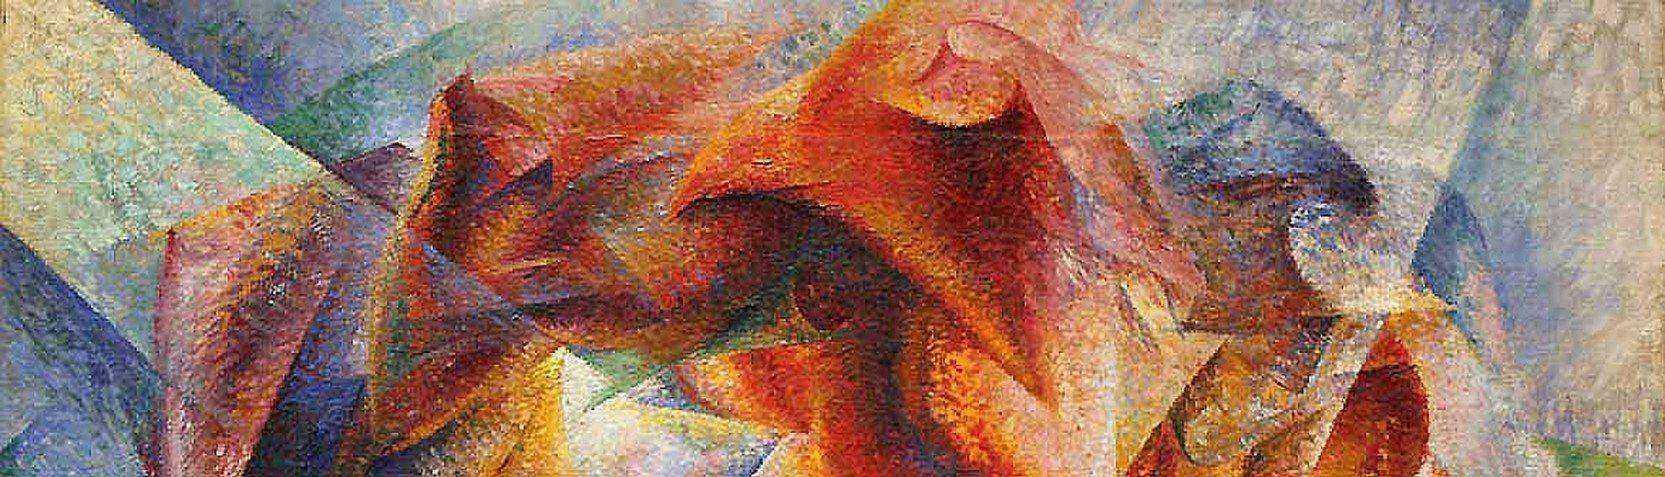 Künstler - Umberto Boccioni